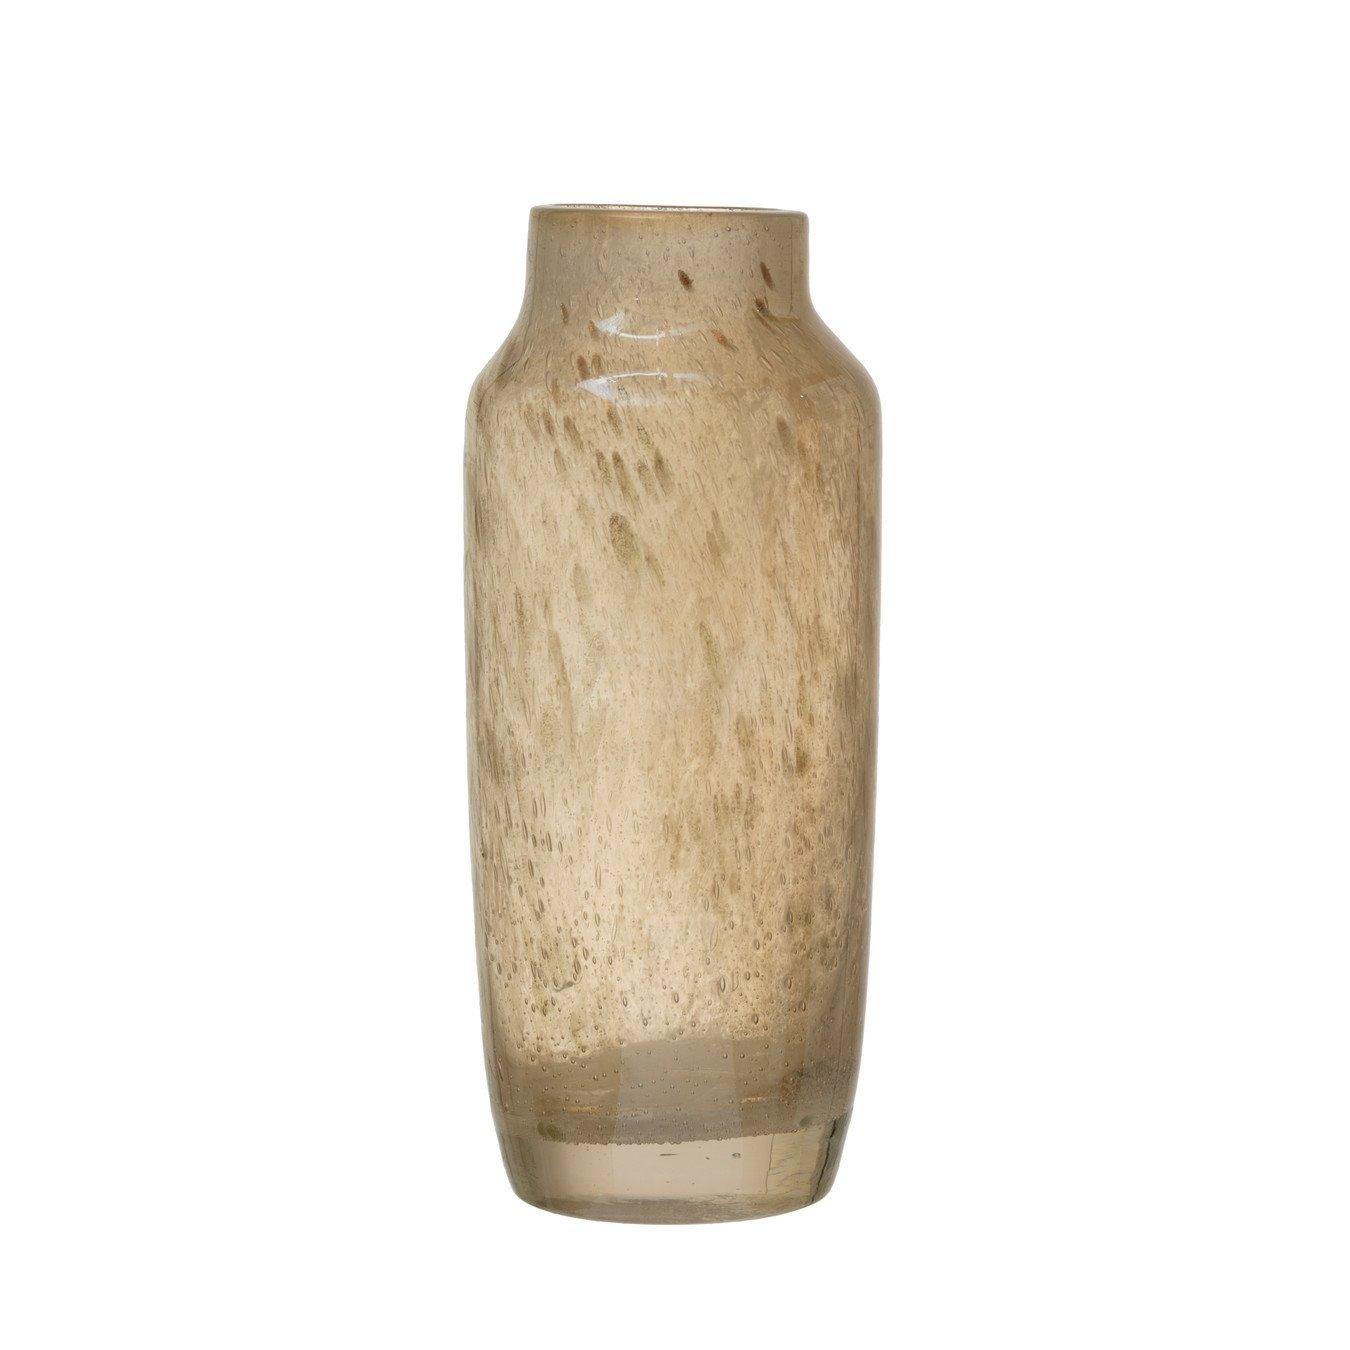 Iridescent Beige Glass Decorative Vase